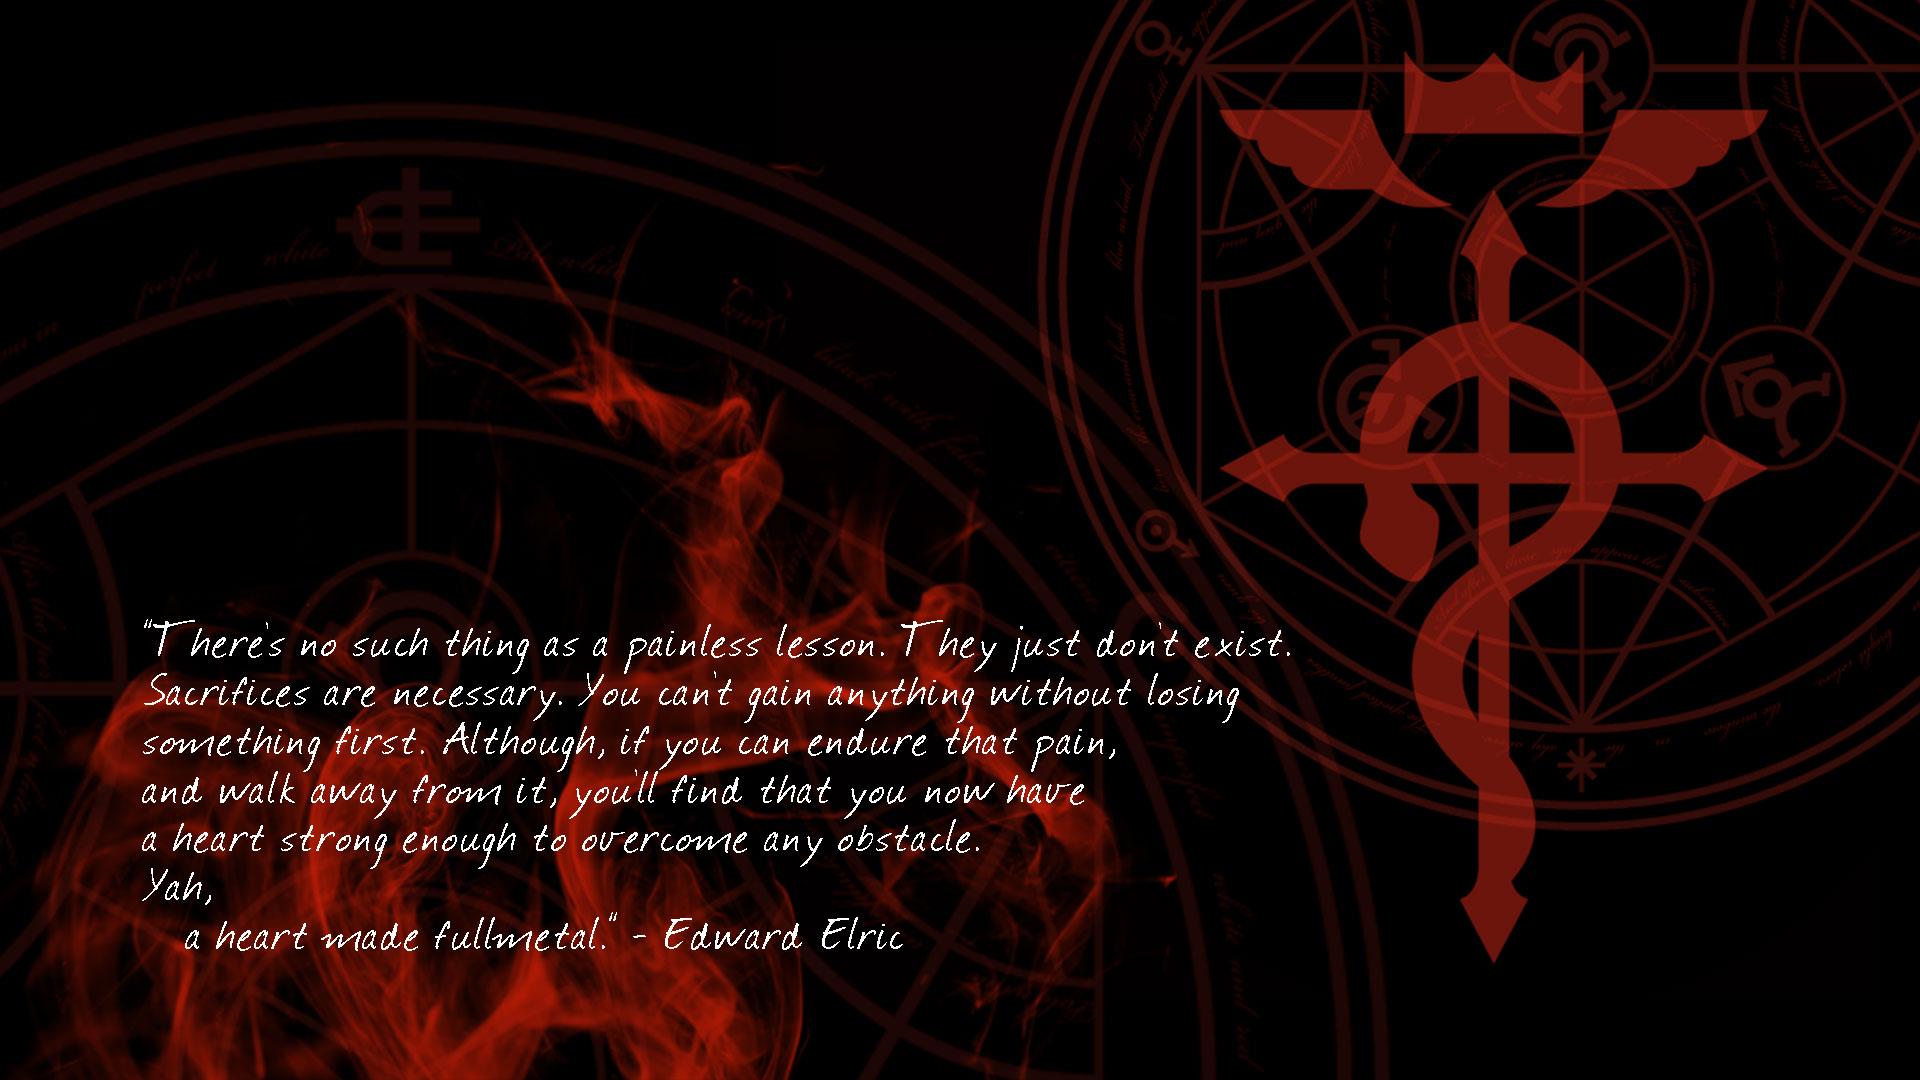 1000+ images about Fullmetal Alchemist on Pinterest ...